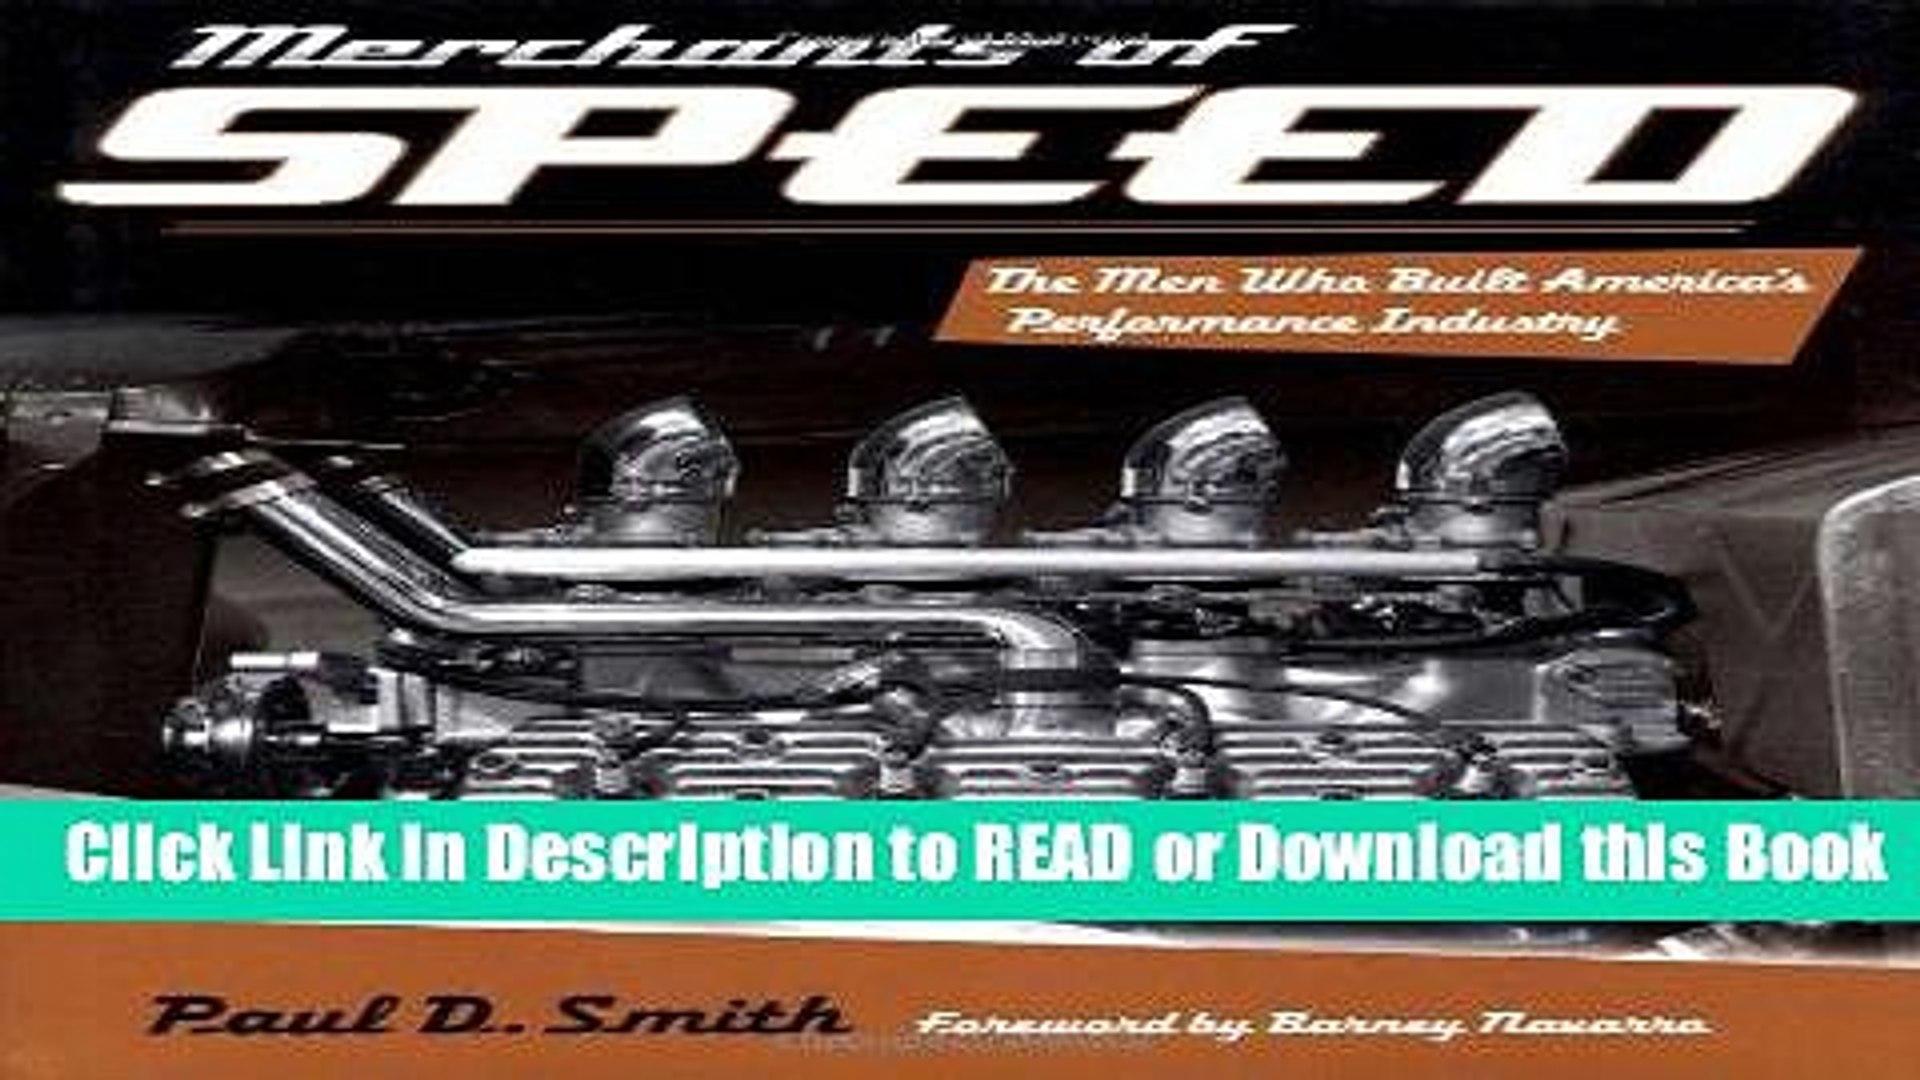 Read Book Merchants of Speed: The Men Who Built America s Performance Industry Read Online